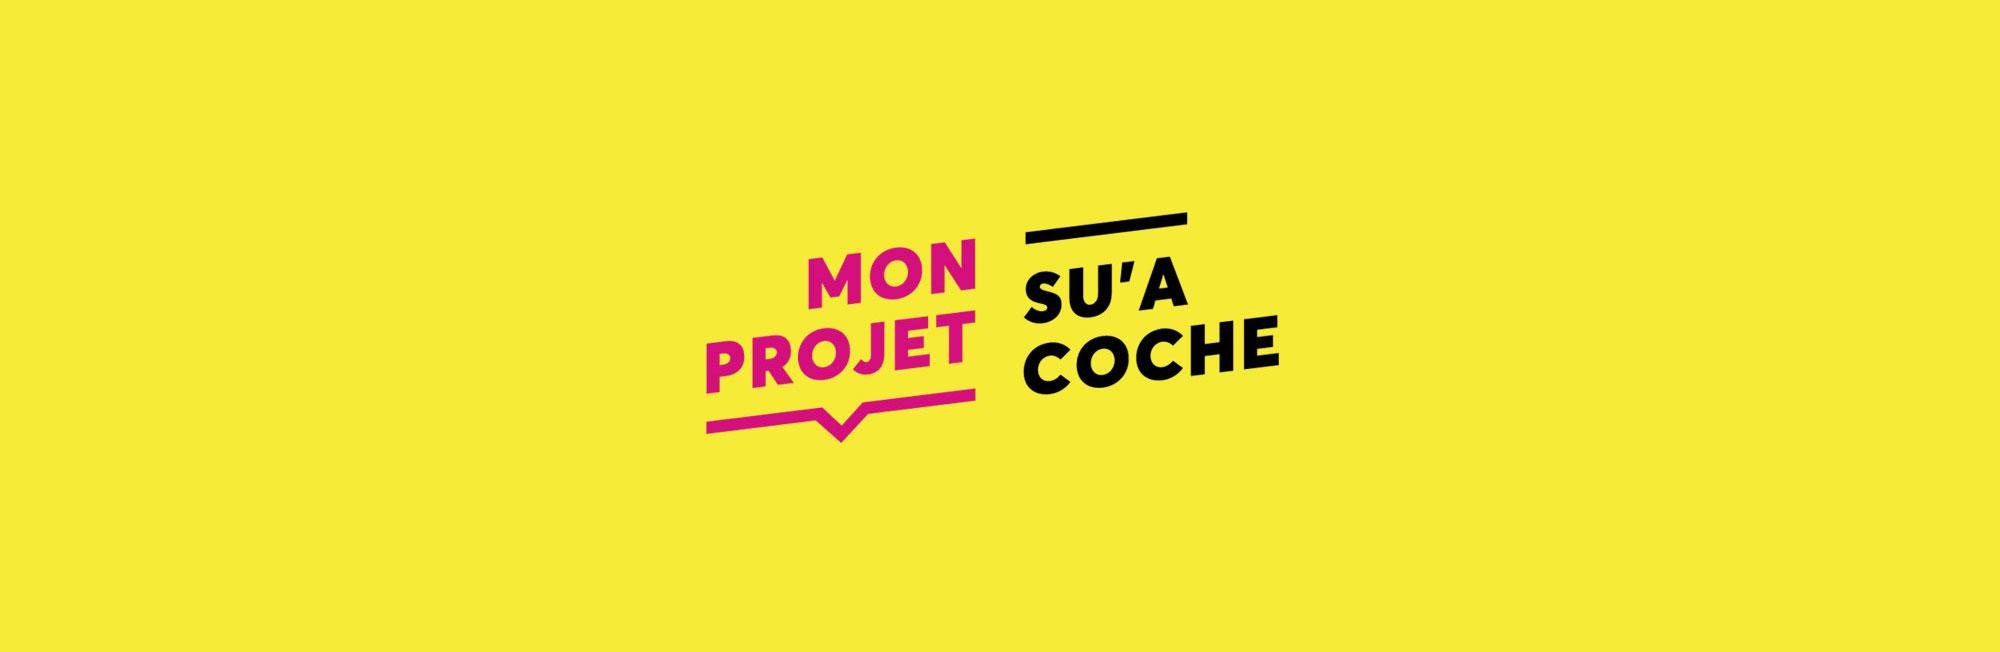 Mockup-MonProjetSuaCoche-10b